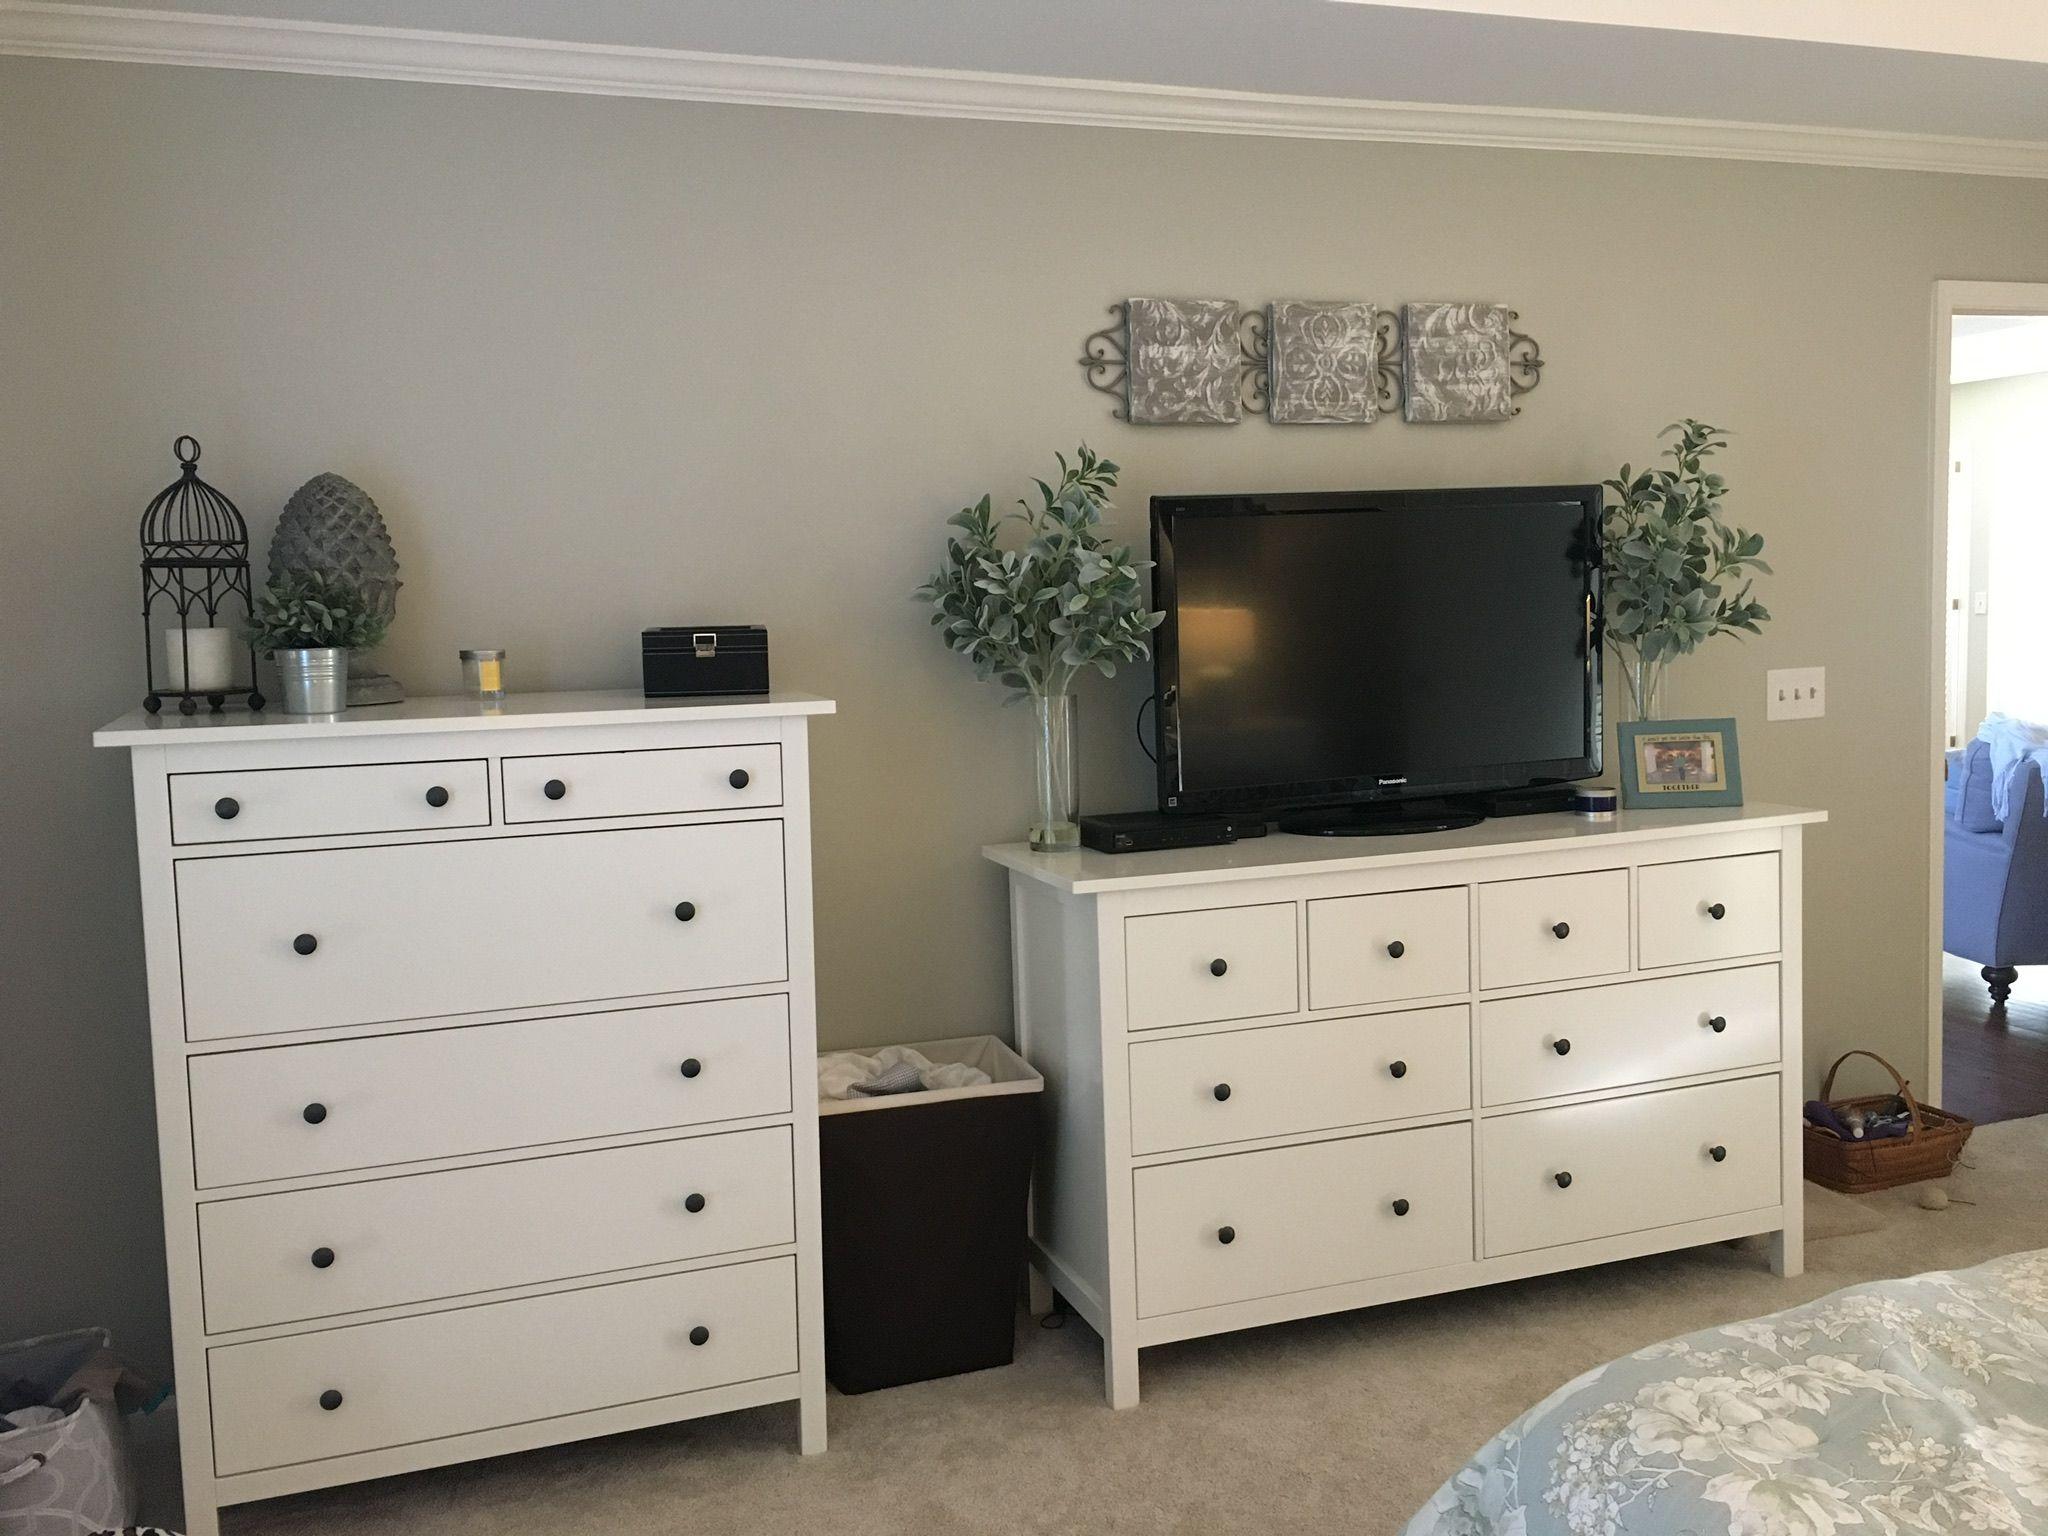 Before Wall With Ikea Hemnes Dresser And Chest Master Bedroom Furniture Dresser Decor Bedroom Bedroom Decor On